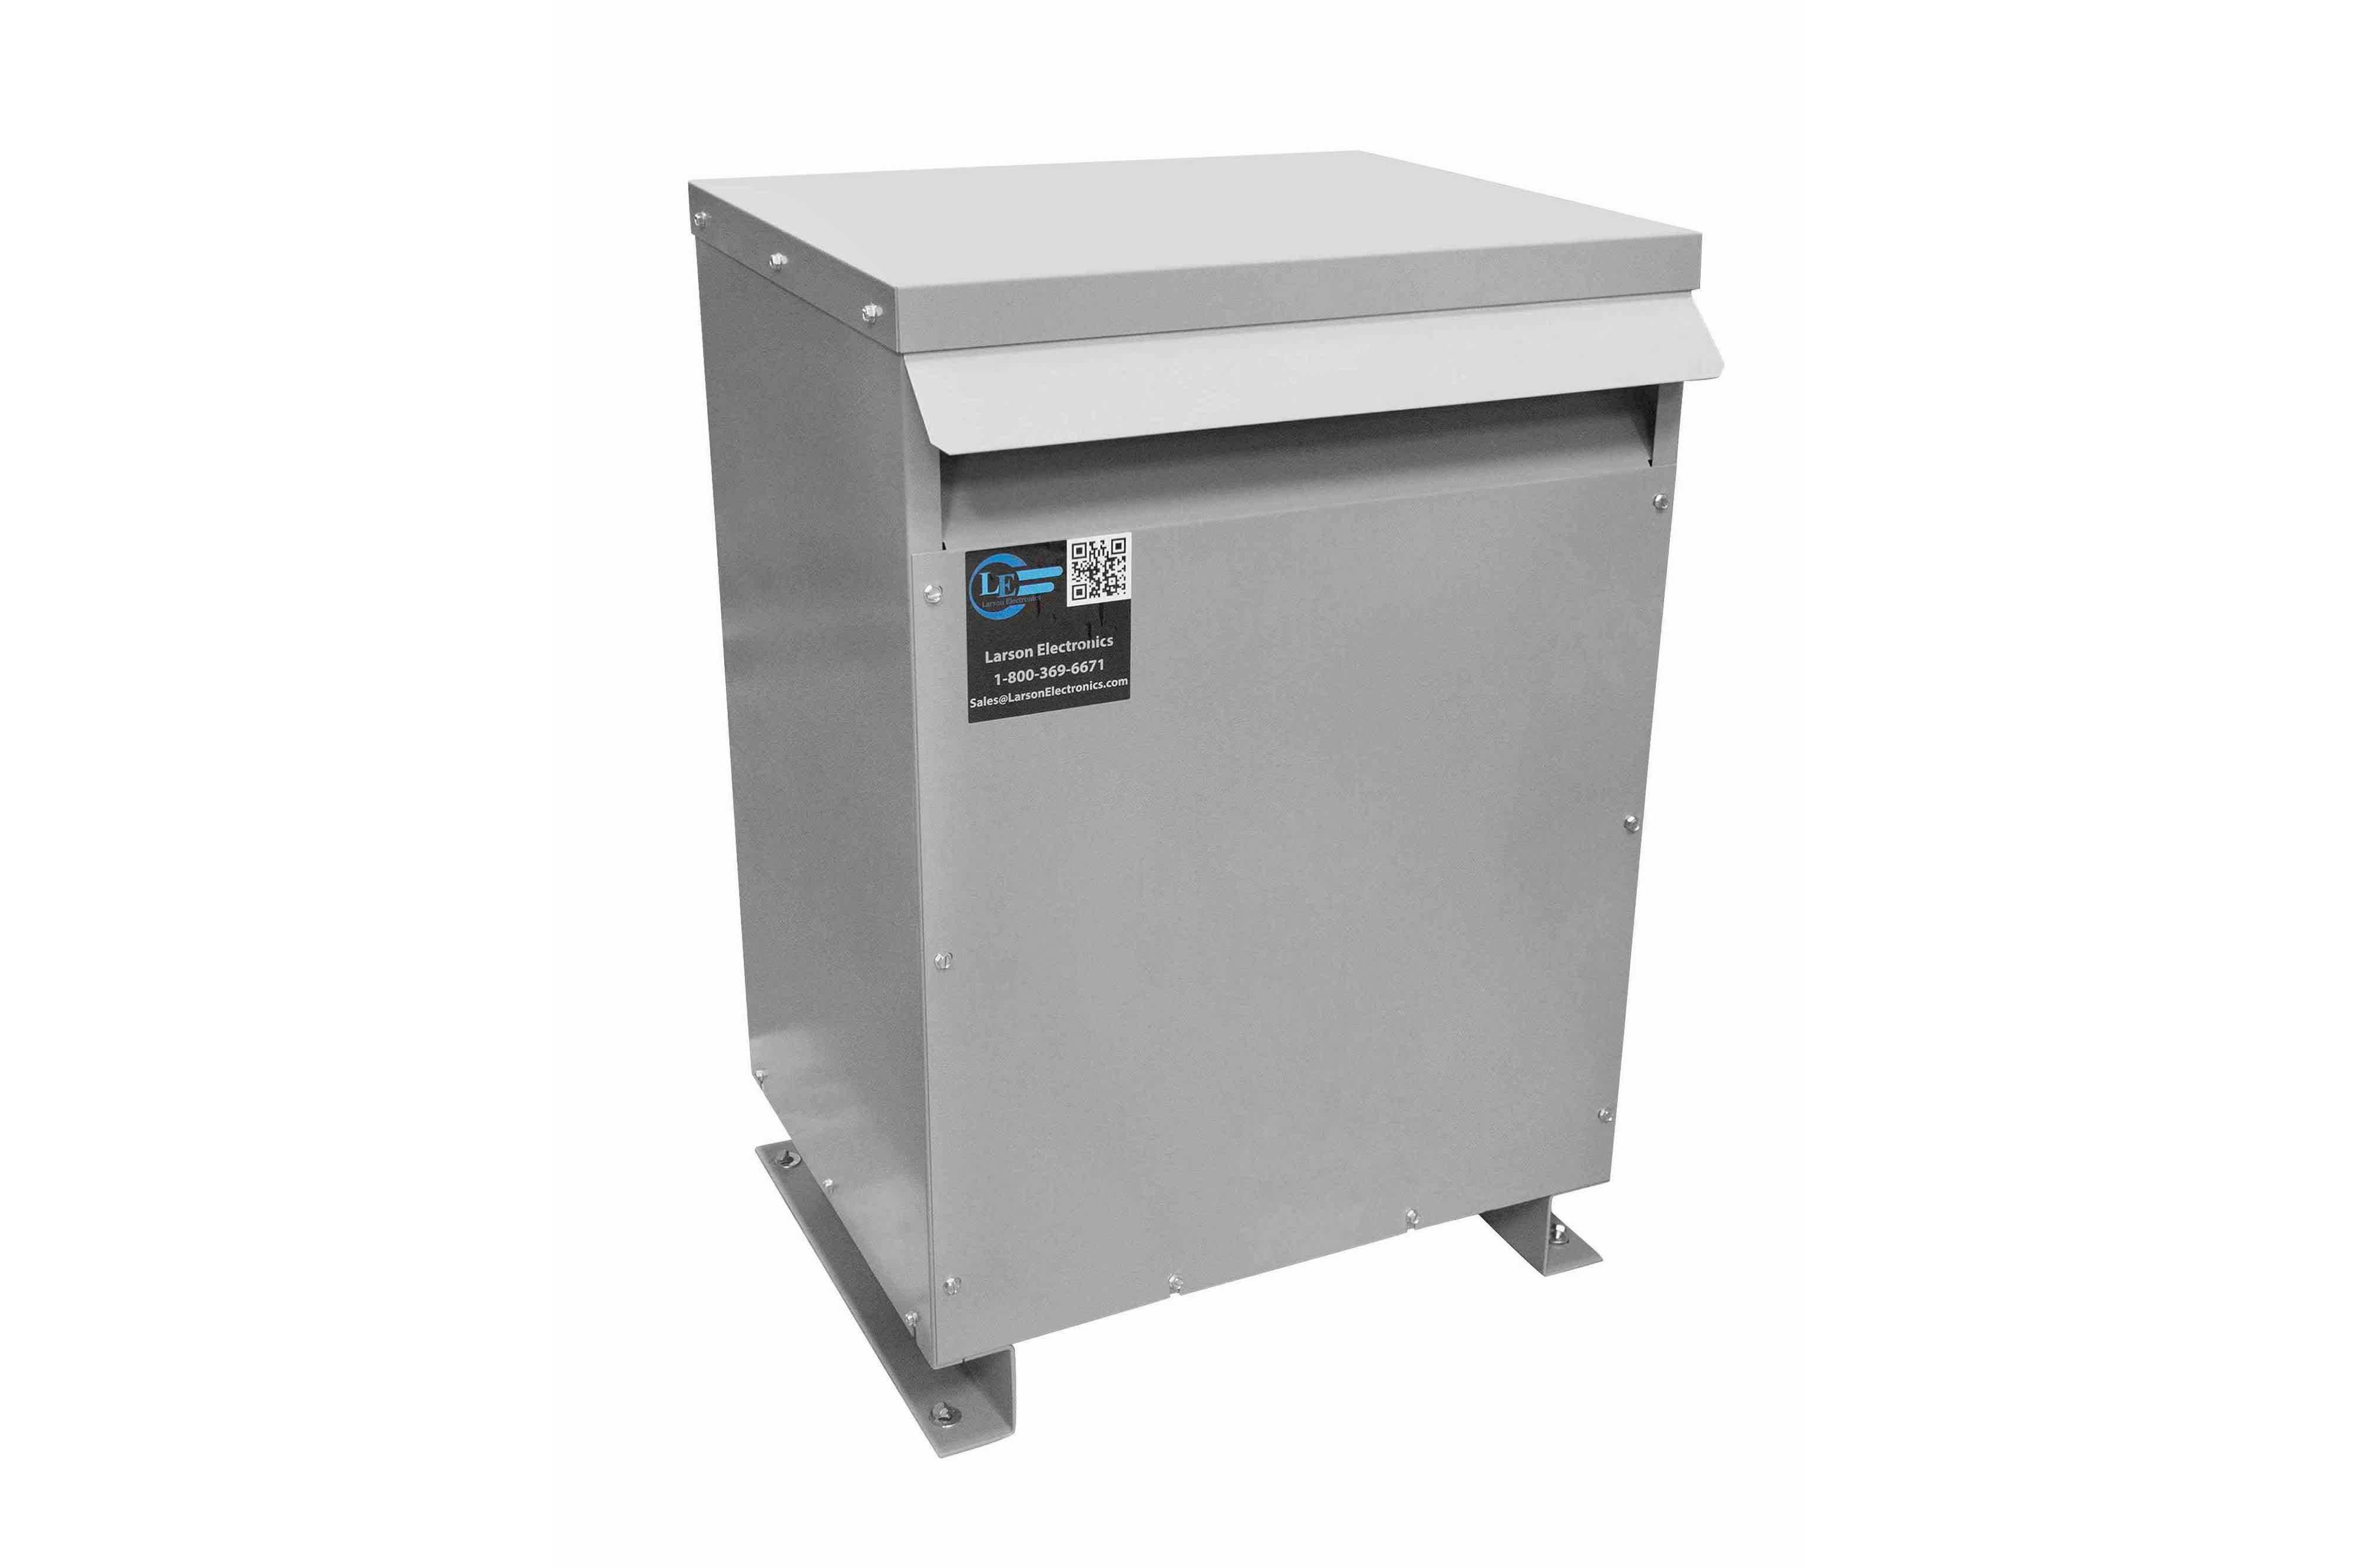 225 kVA 3PH Isolation Transformer, 480V Wye Primary, 208Y/120 Wye-N Secondary, N3R, Ventilated, 60 Hz